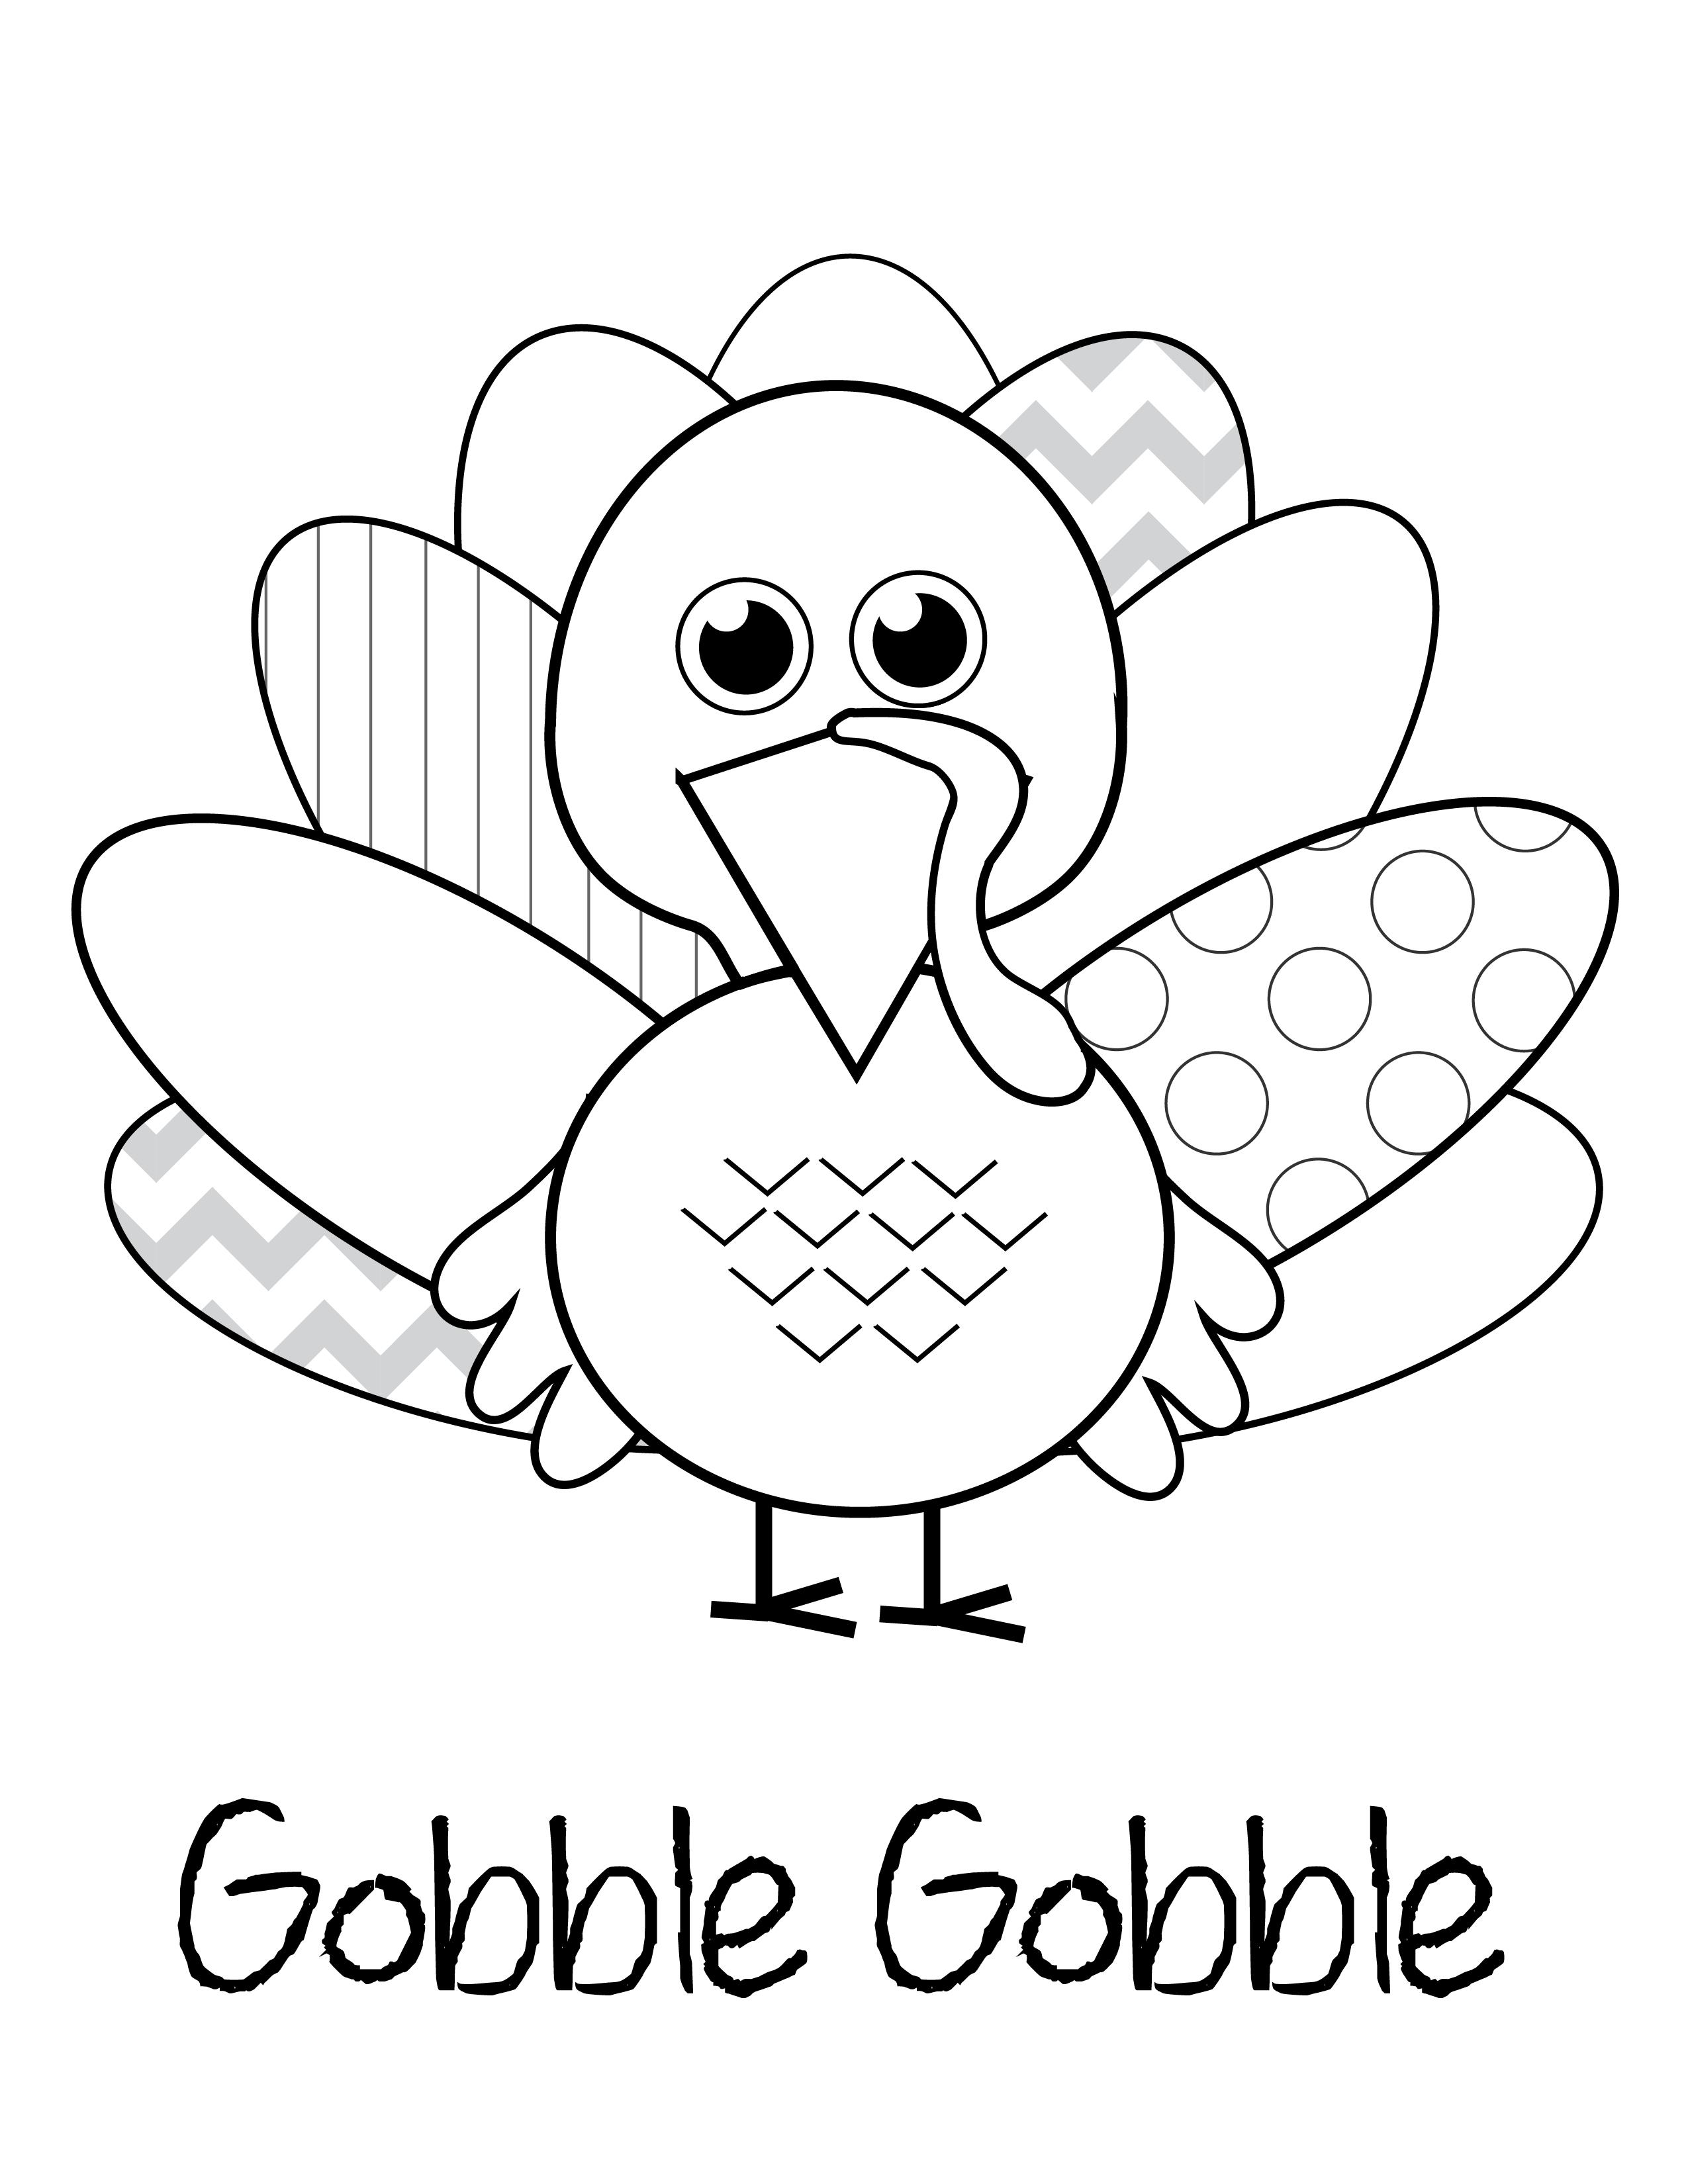 Free Thanksgiving Printables   Printable   Dibujos De Acción De - Free Printable Thanksgiving Activities For Preschoolers